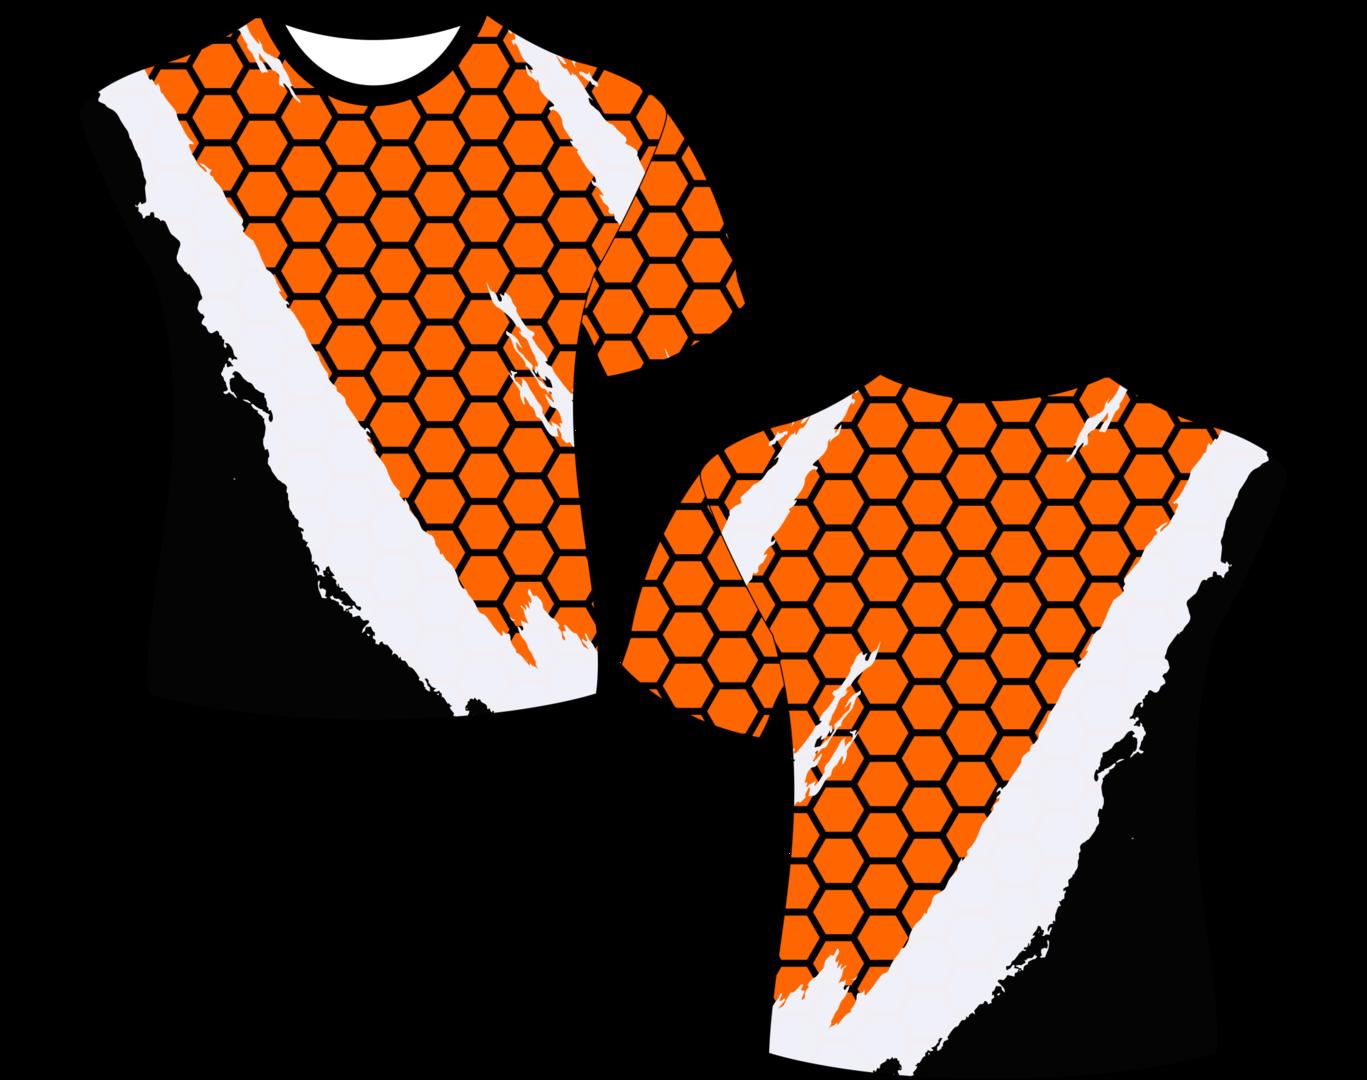 Full Dye Shirts - Baseball Jerseys, Baseball Shirt